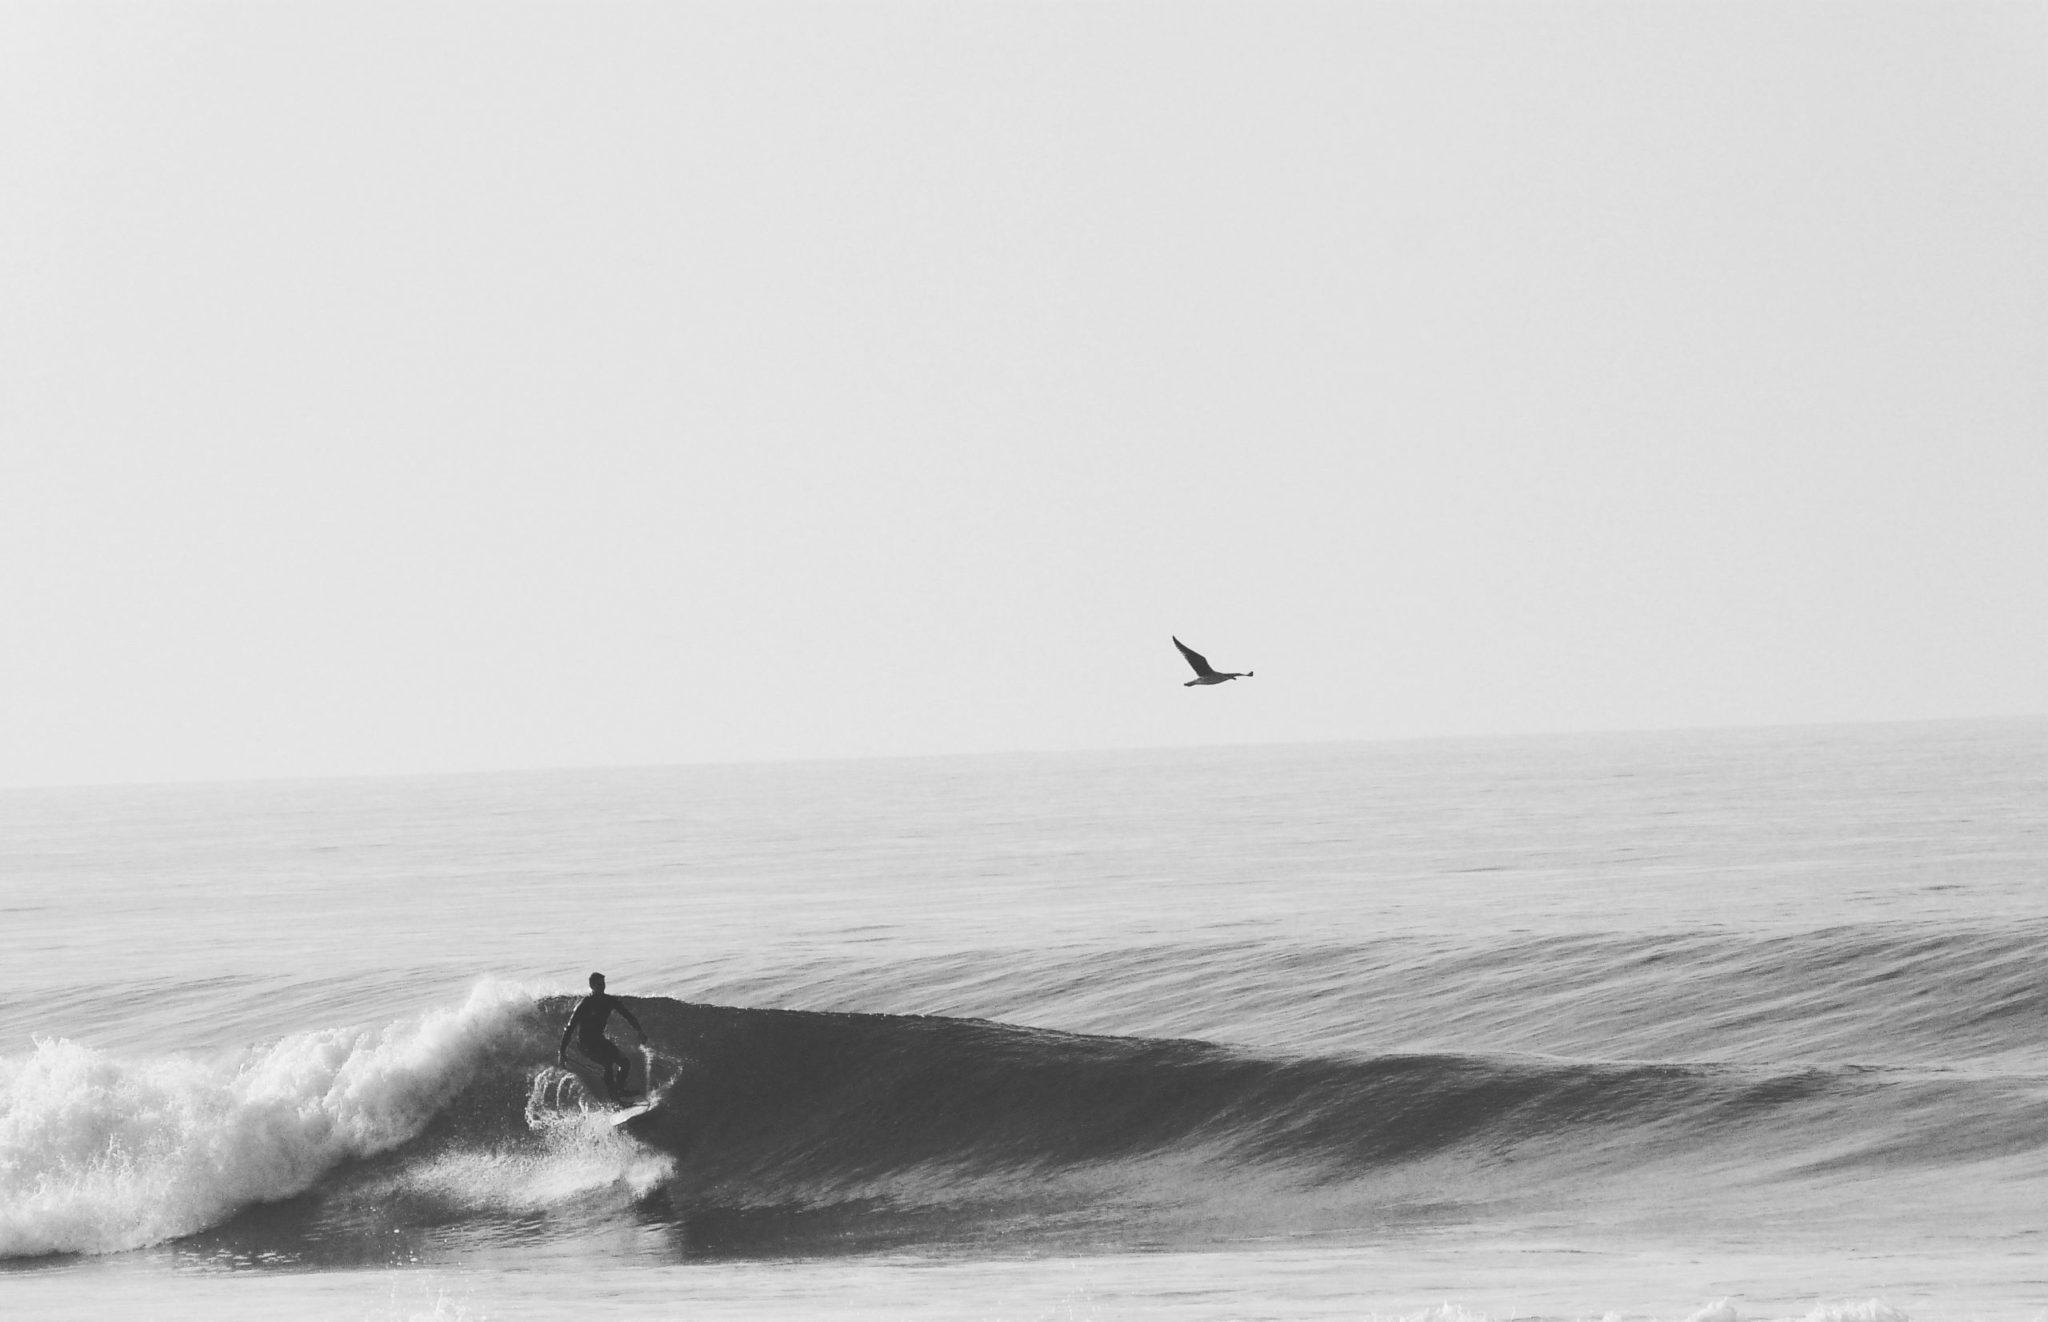 Cachalot Surfboards planche surf bois artisan shape atelier hollow wooden surfboard